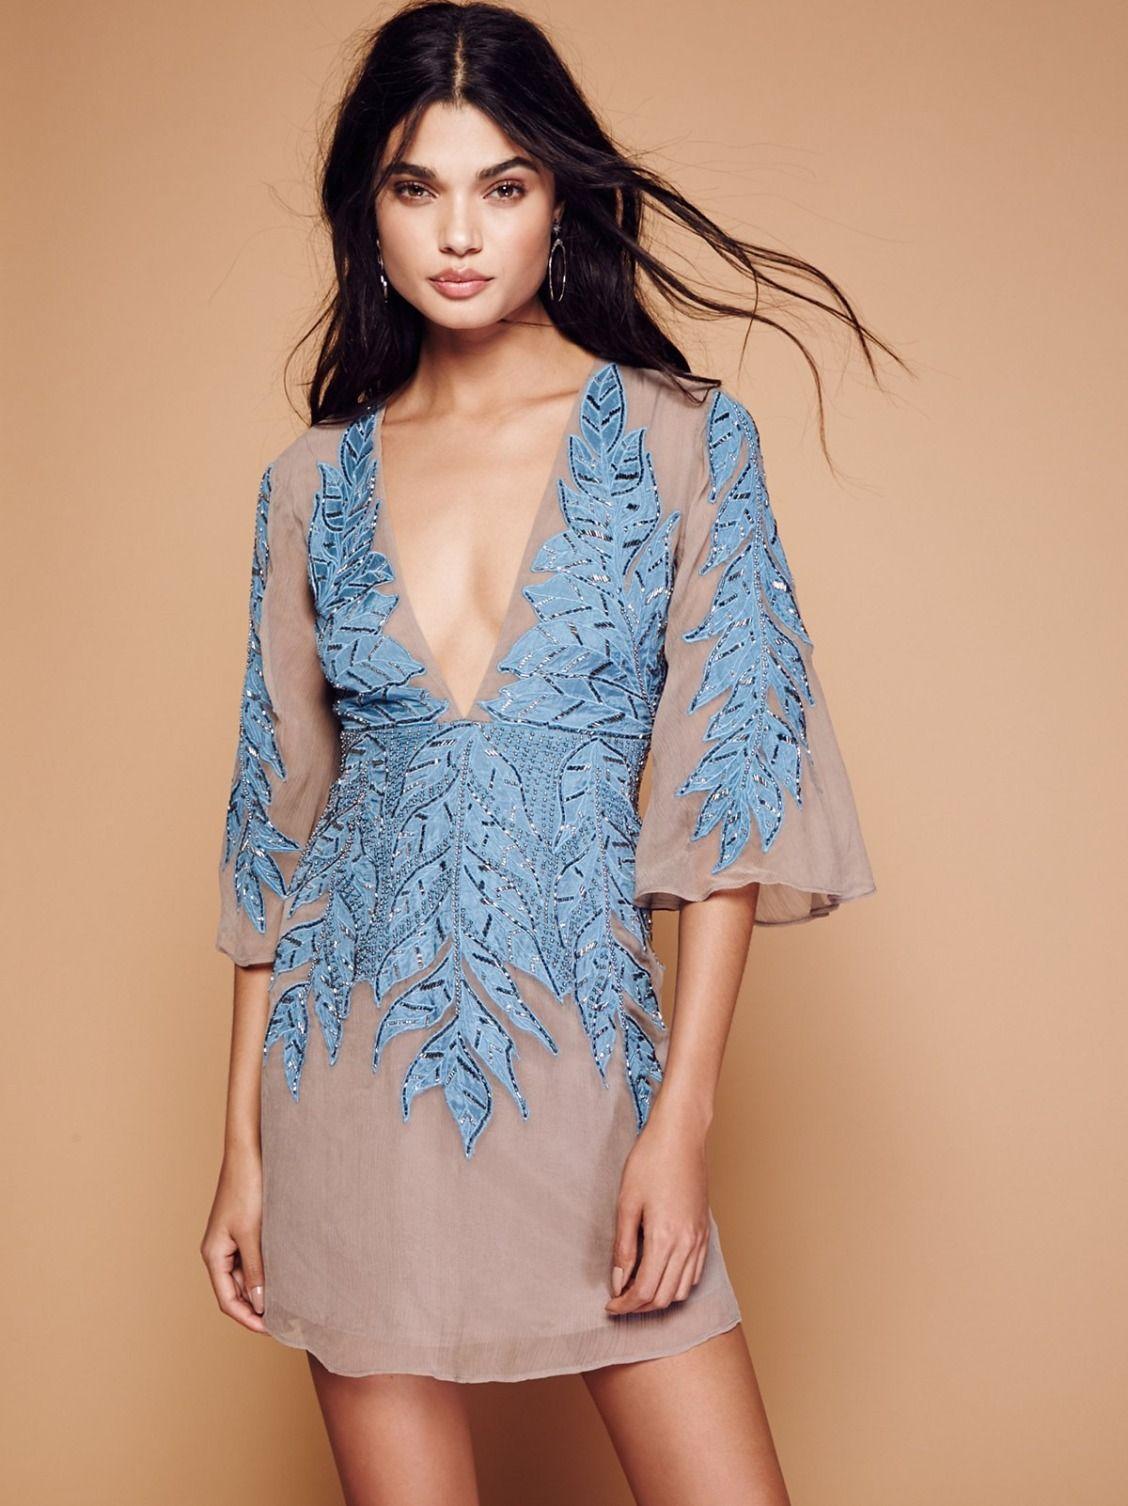 Songbird Embellished Mini Dress | Stunning party dress featuring eye ...